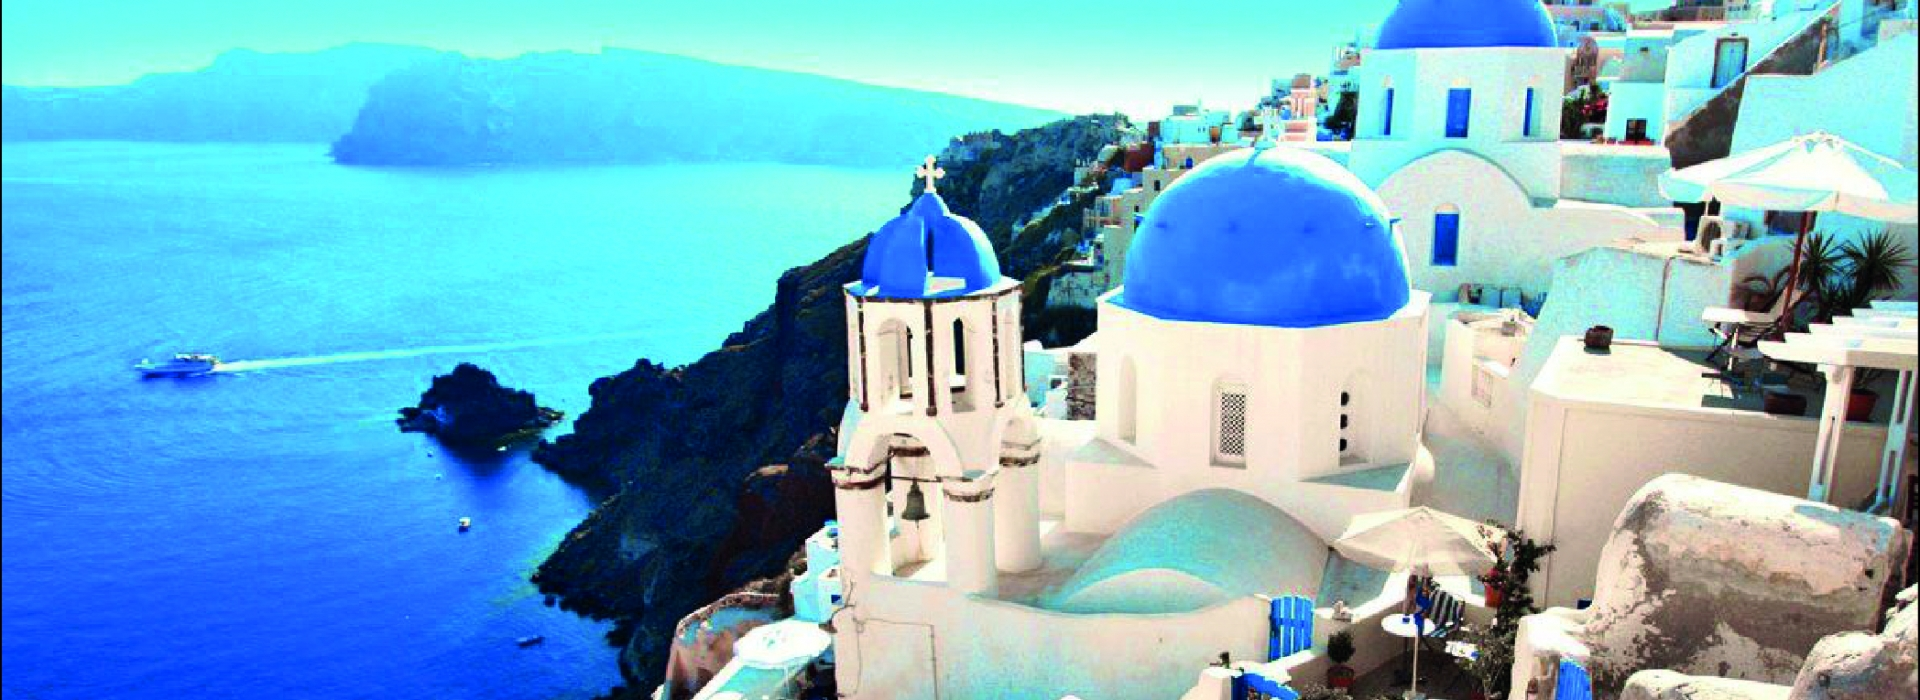 Grecia & Islas